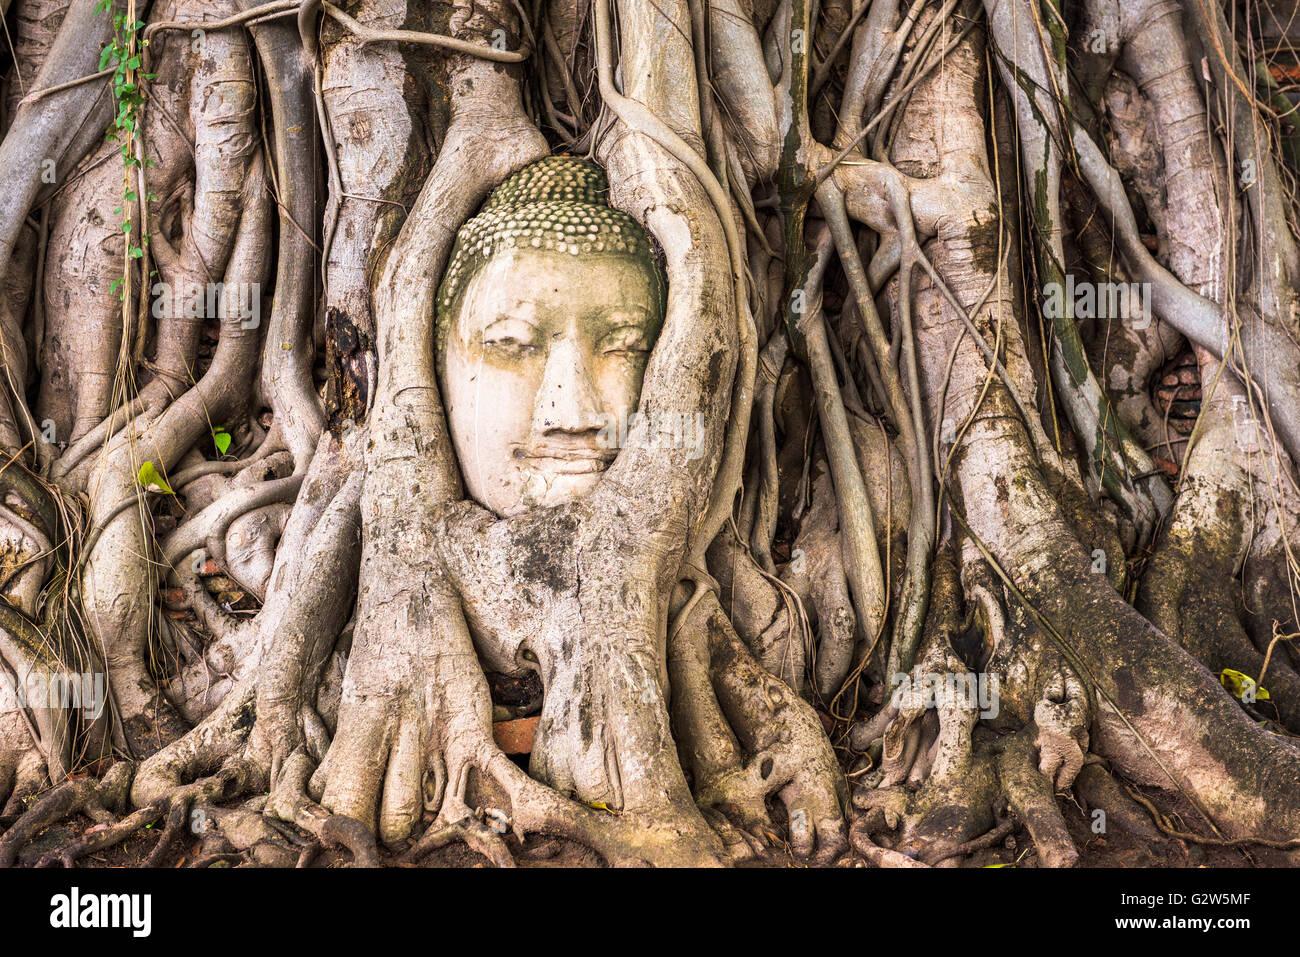 Testa di Buddha in banyan tree radici di Wat Mahathat in Ayutthaya, Thailandia. Immagini Stock